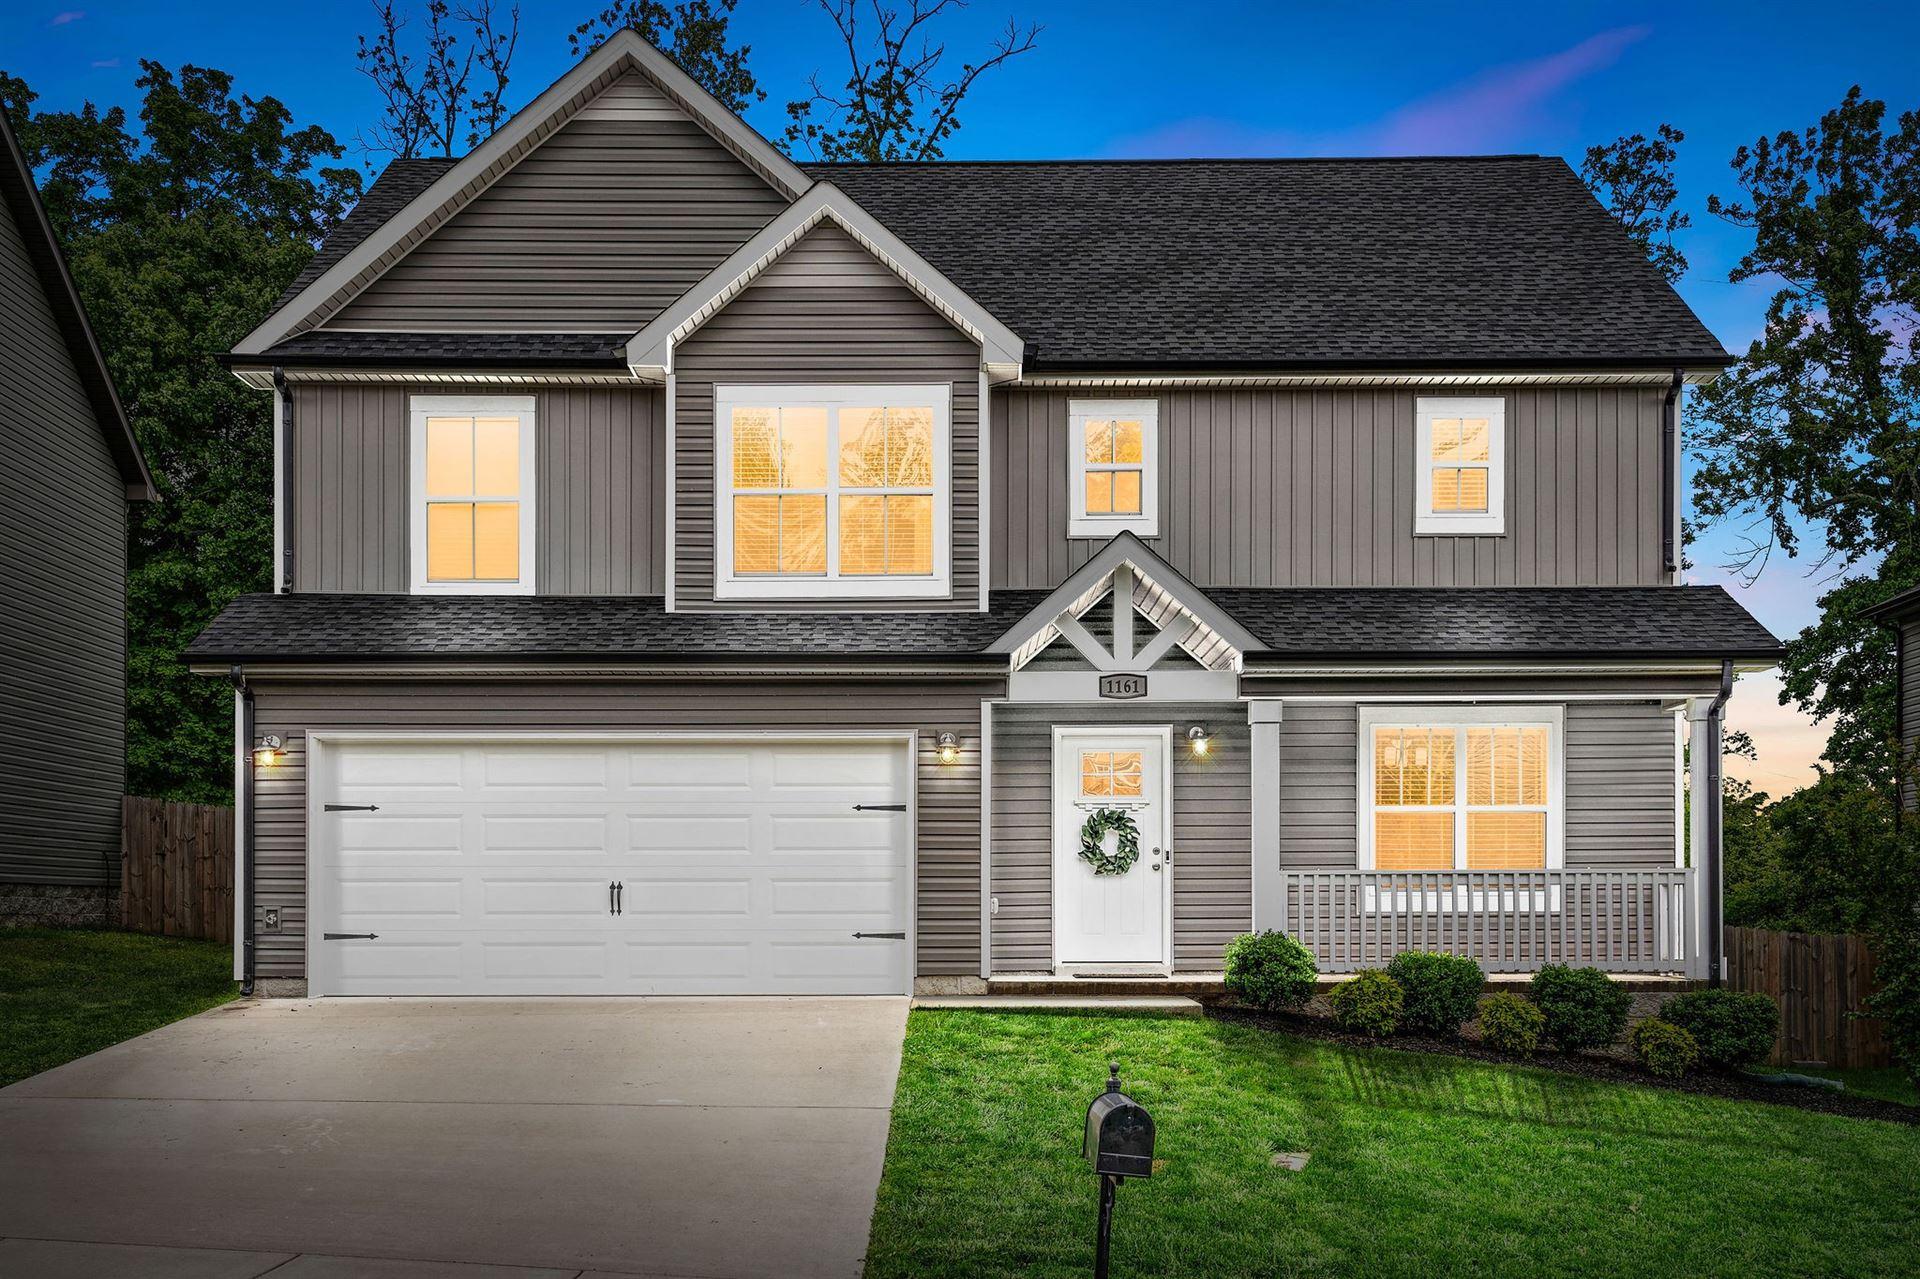 1161 Belvoir Lane, Clarksville, TN 37040 - MLS#: 2253505